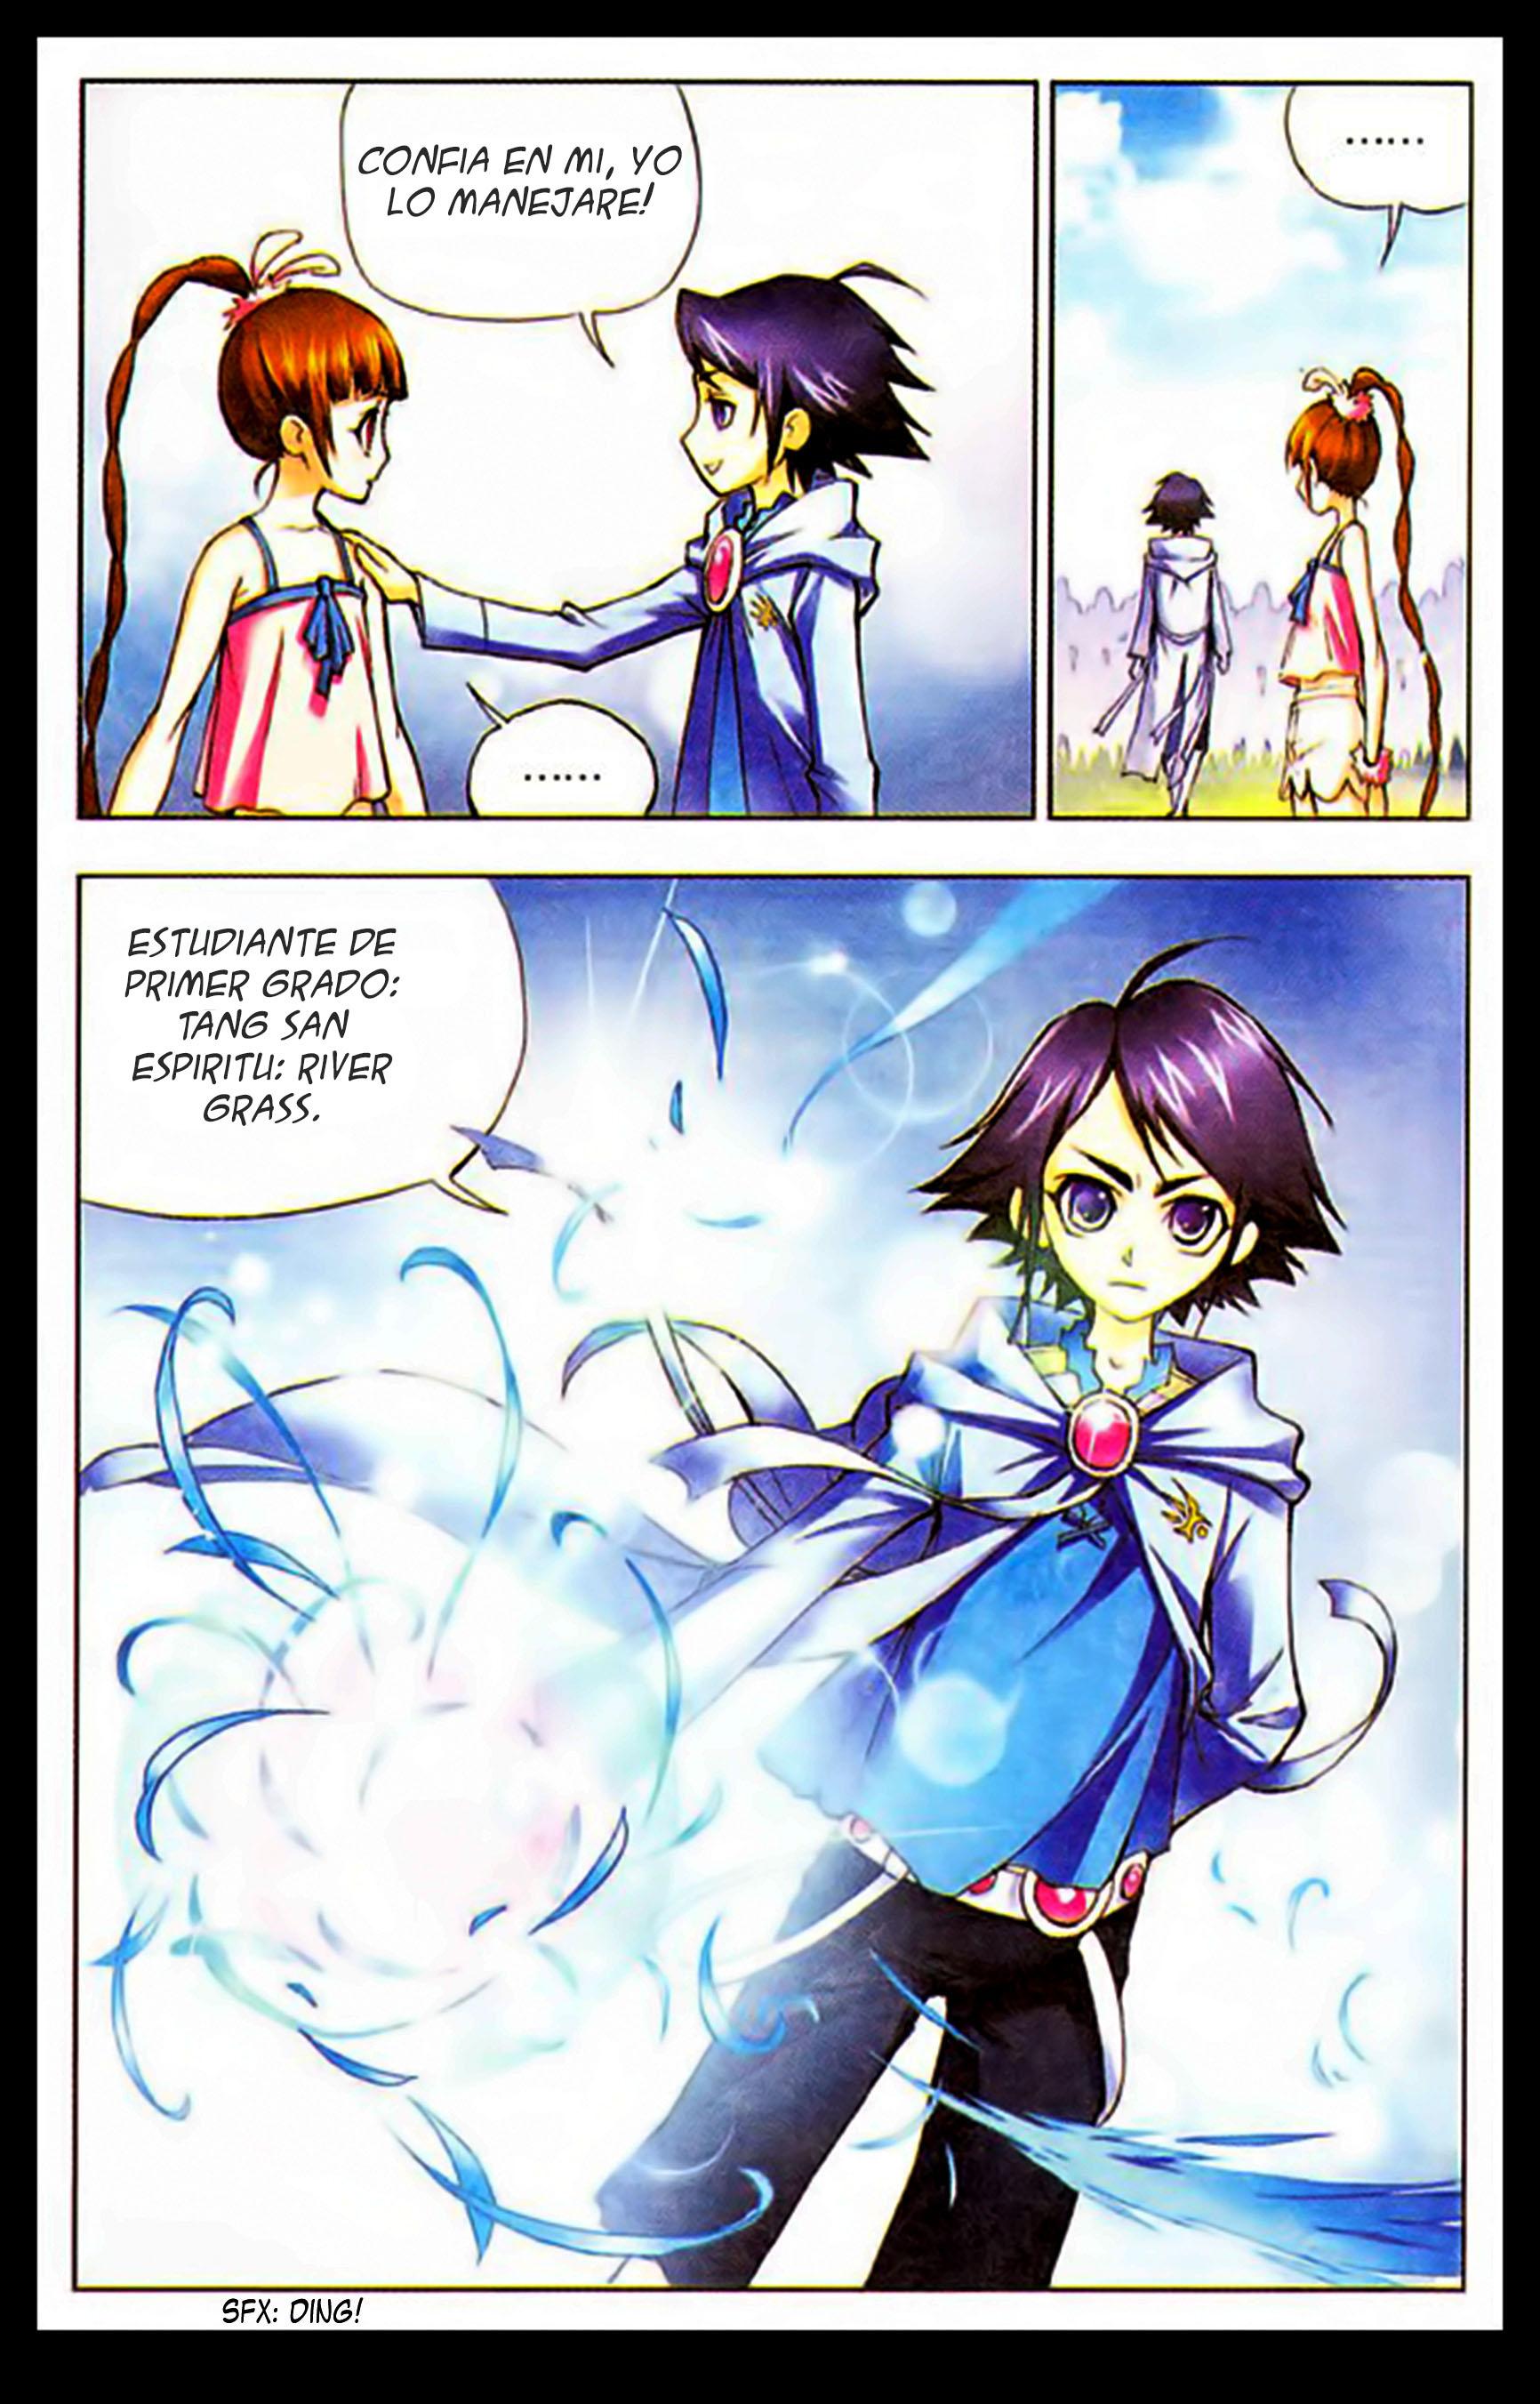 http://c5.ninemanga.com/es_manga/18/16210/390088/624207dedffe0a35c058d63d600213f4.jpg Page 8